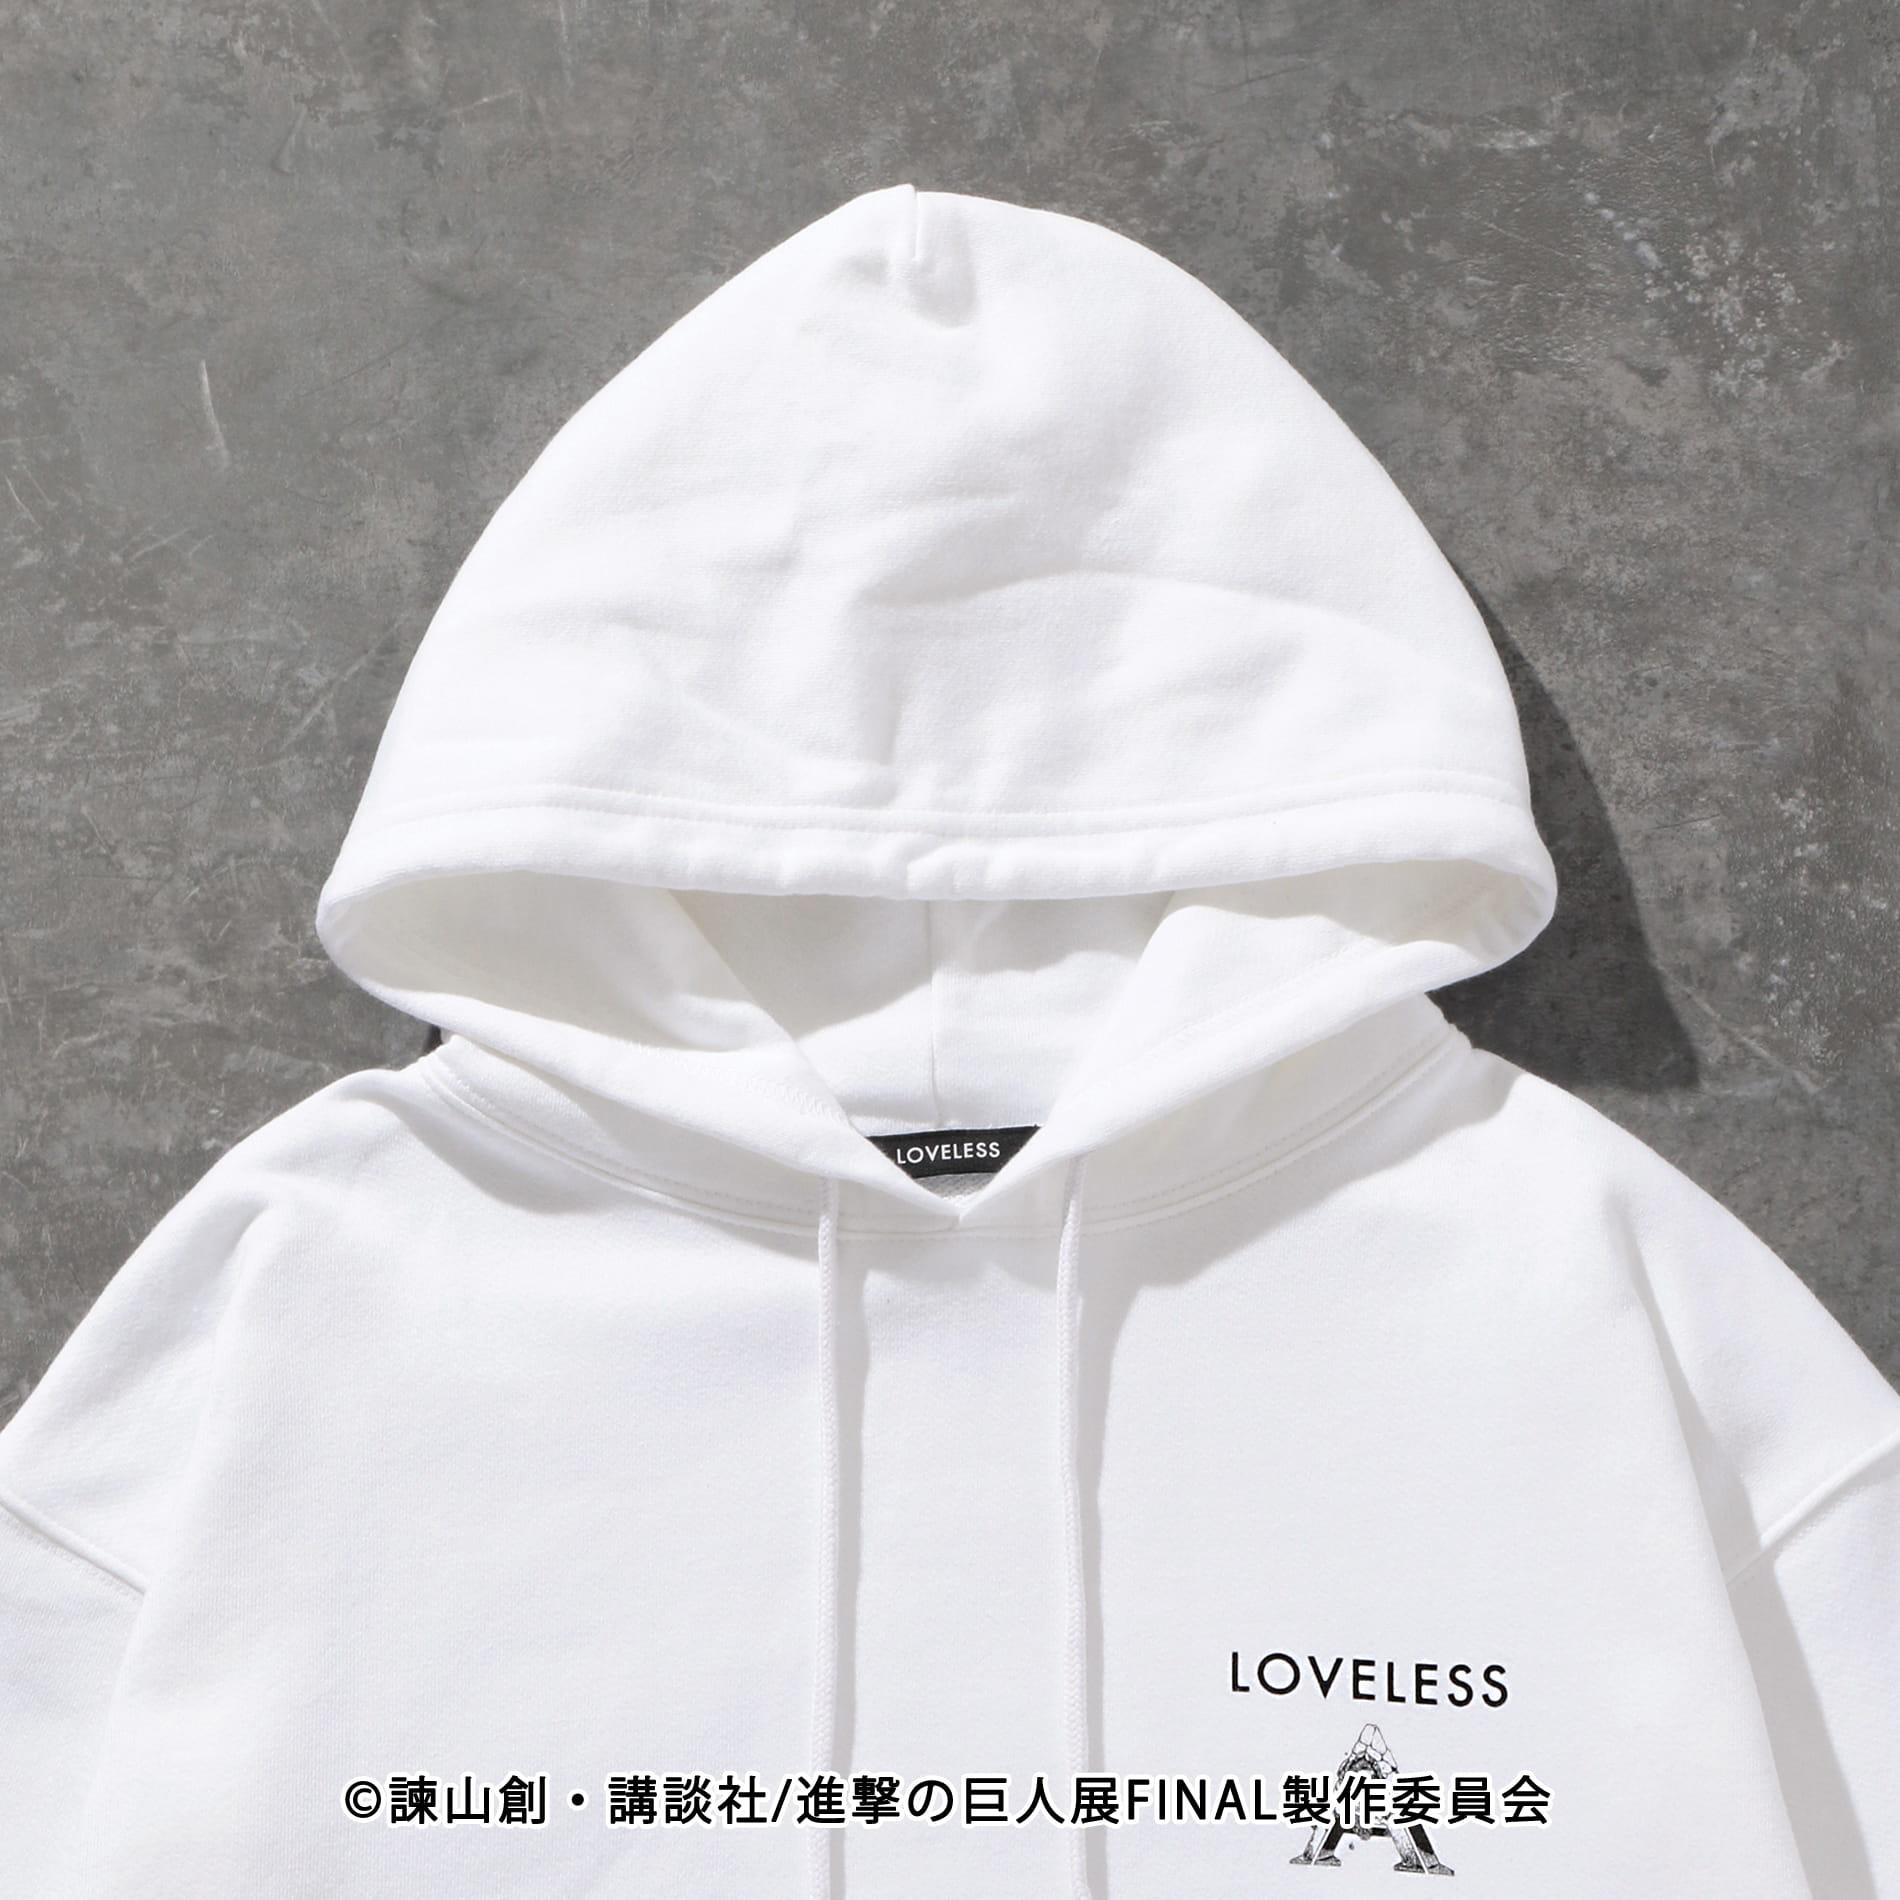 【LOVELESS×進撃の巨人】リヴァイ コラボ フーディー